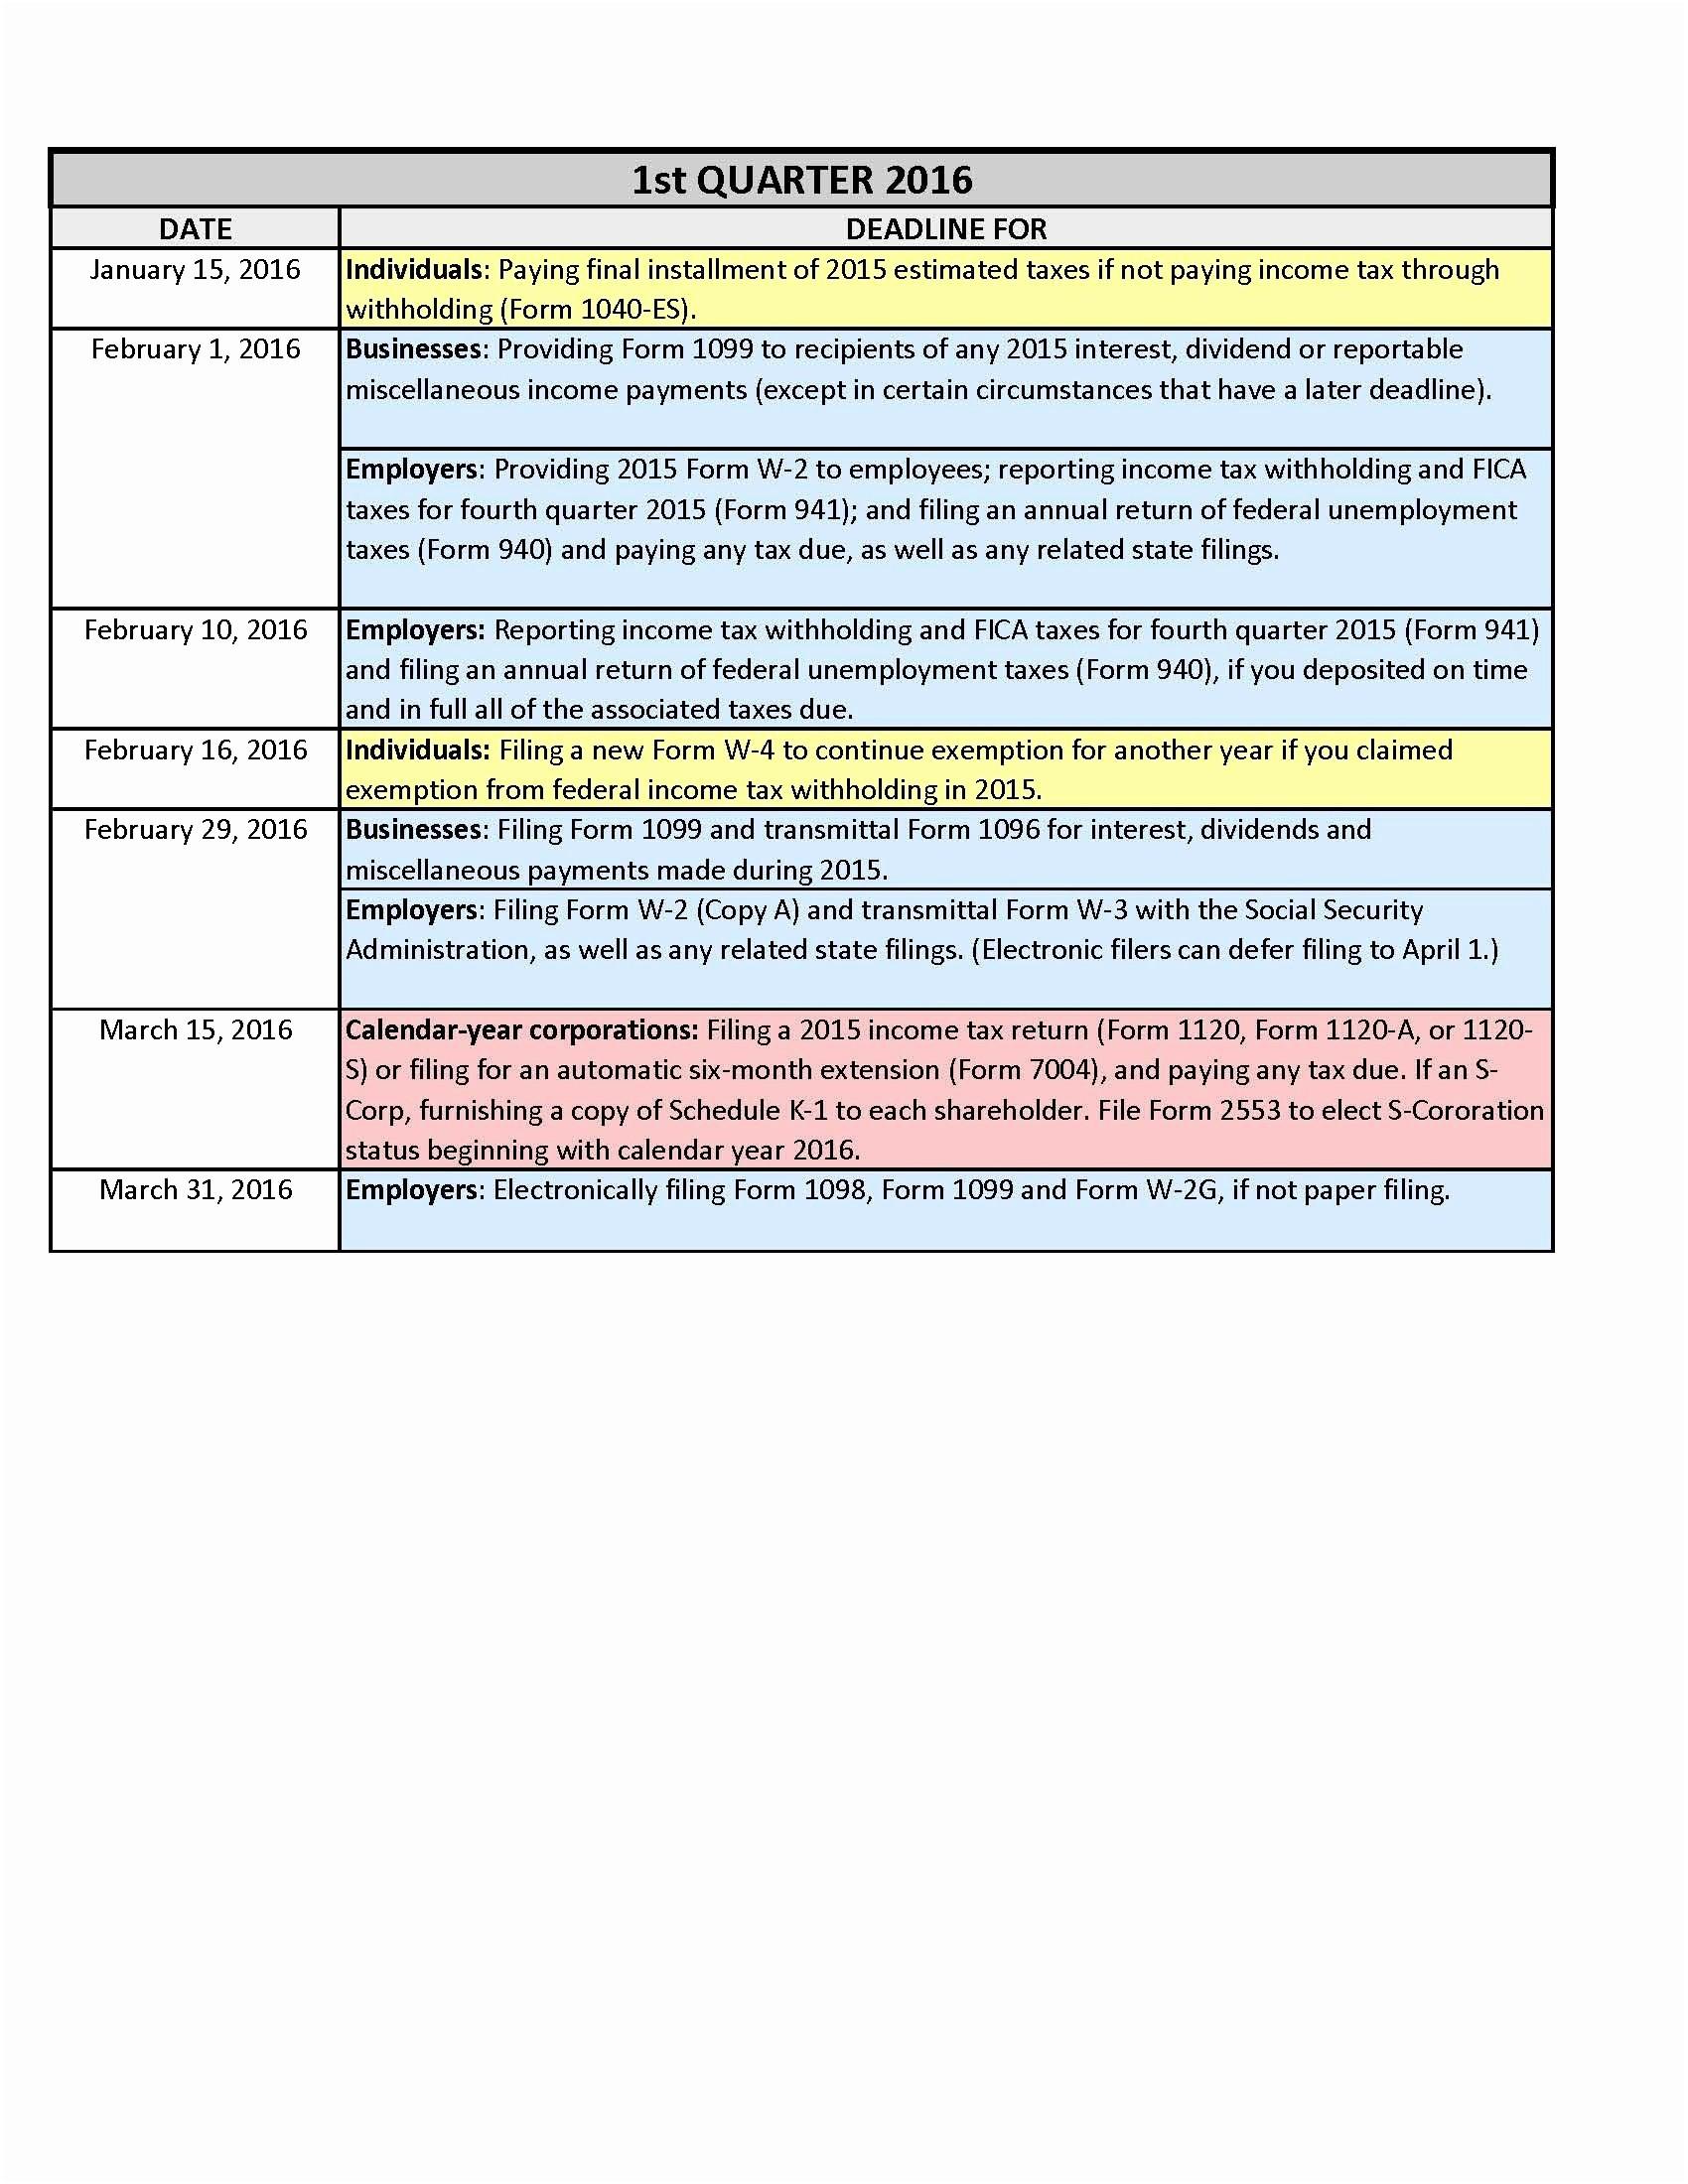 March Calendar Events